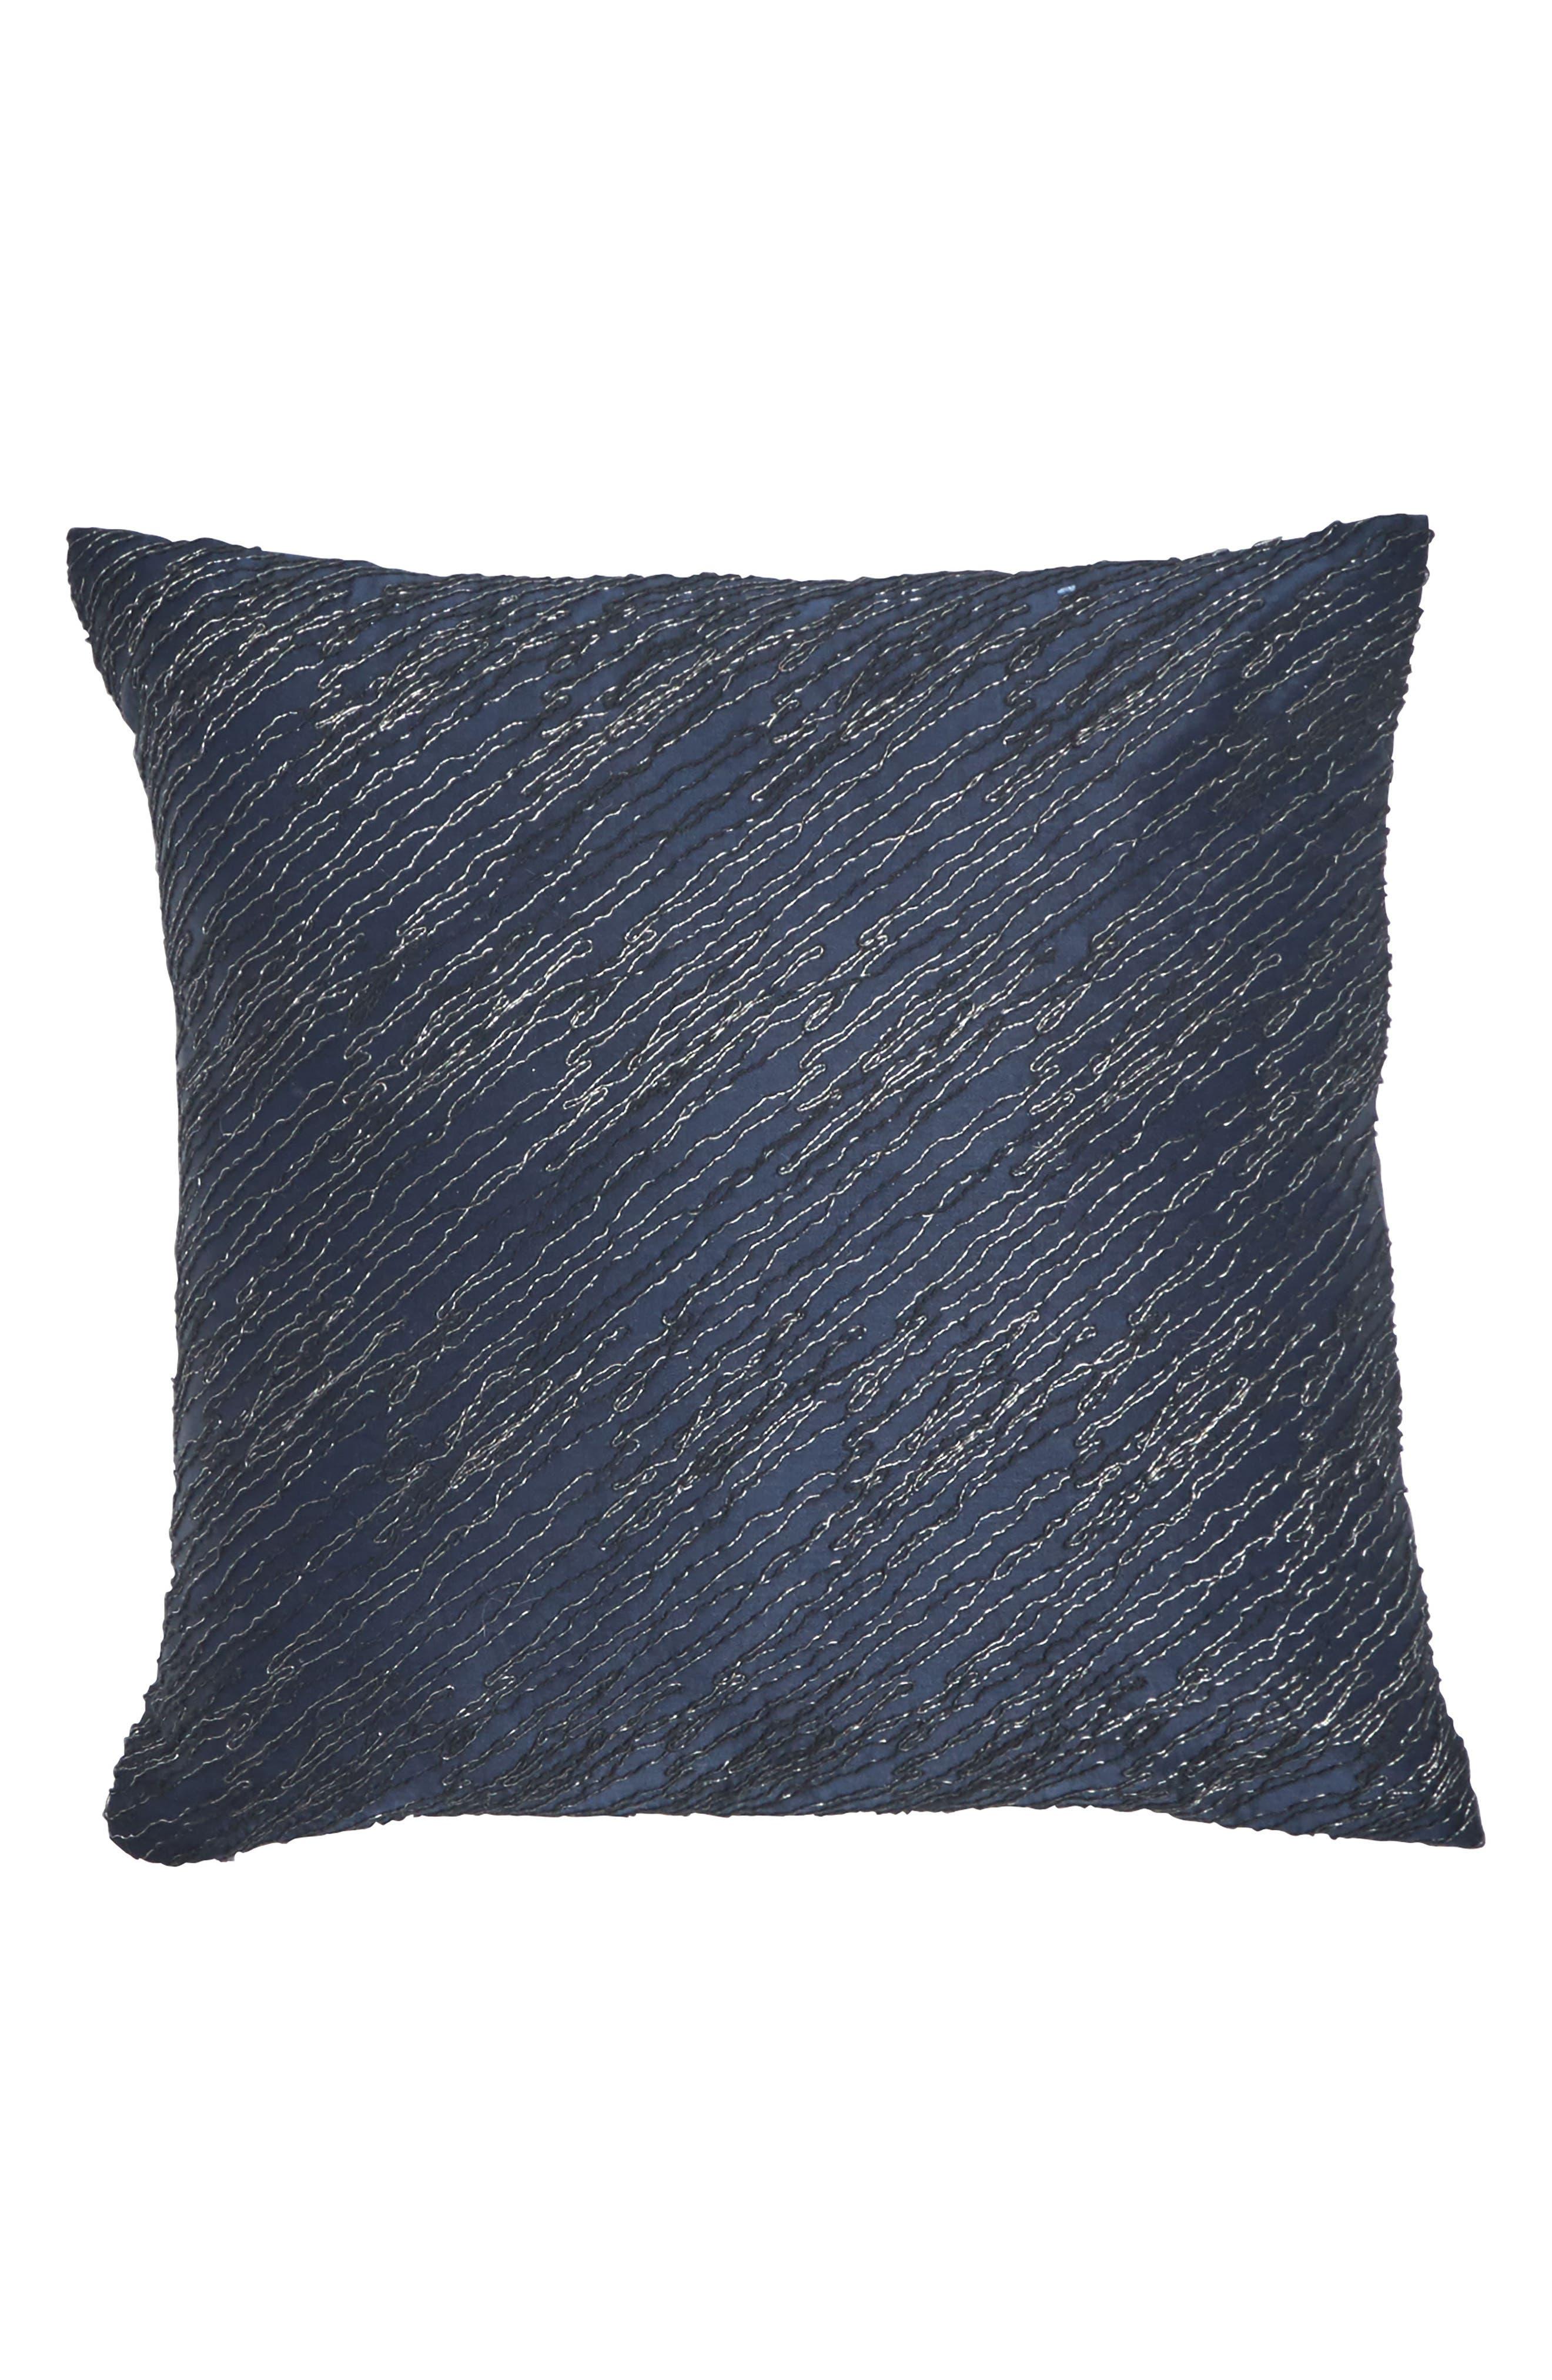 Ocean Pillow,                         Main,                         color, Navy